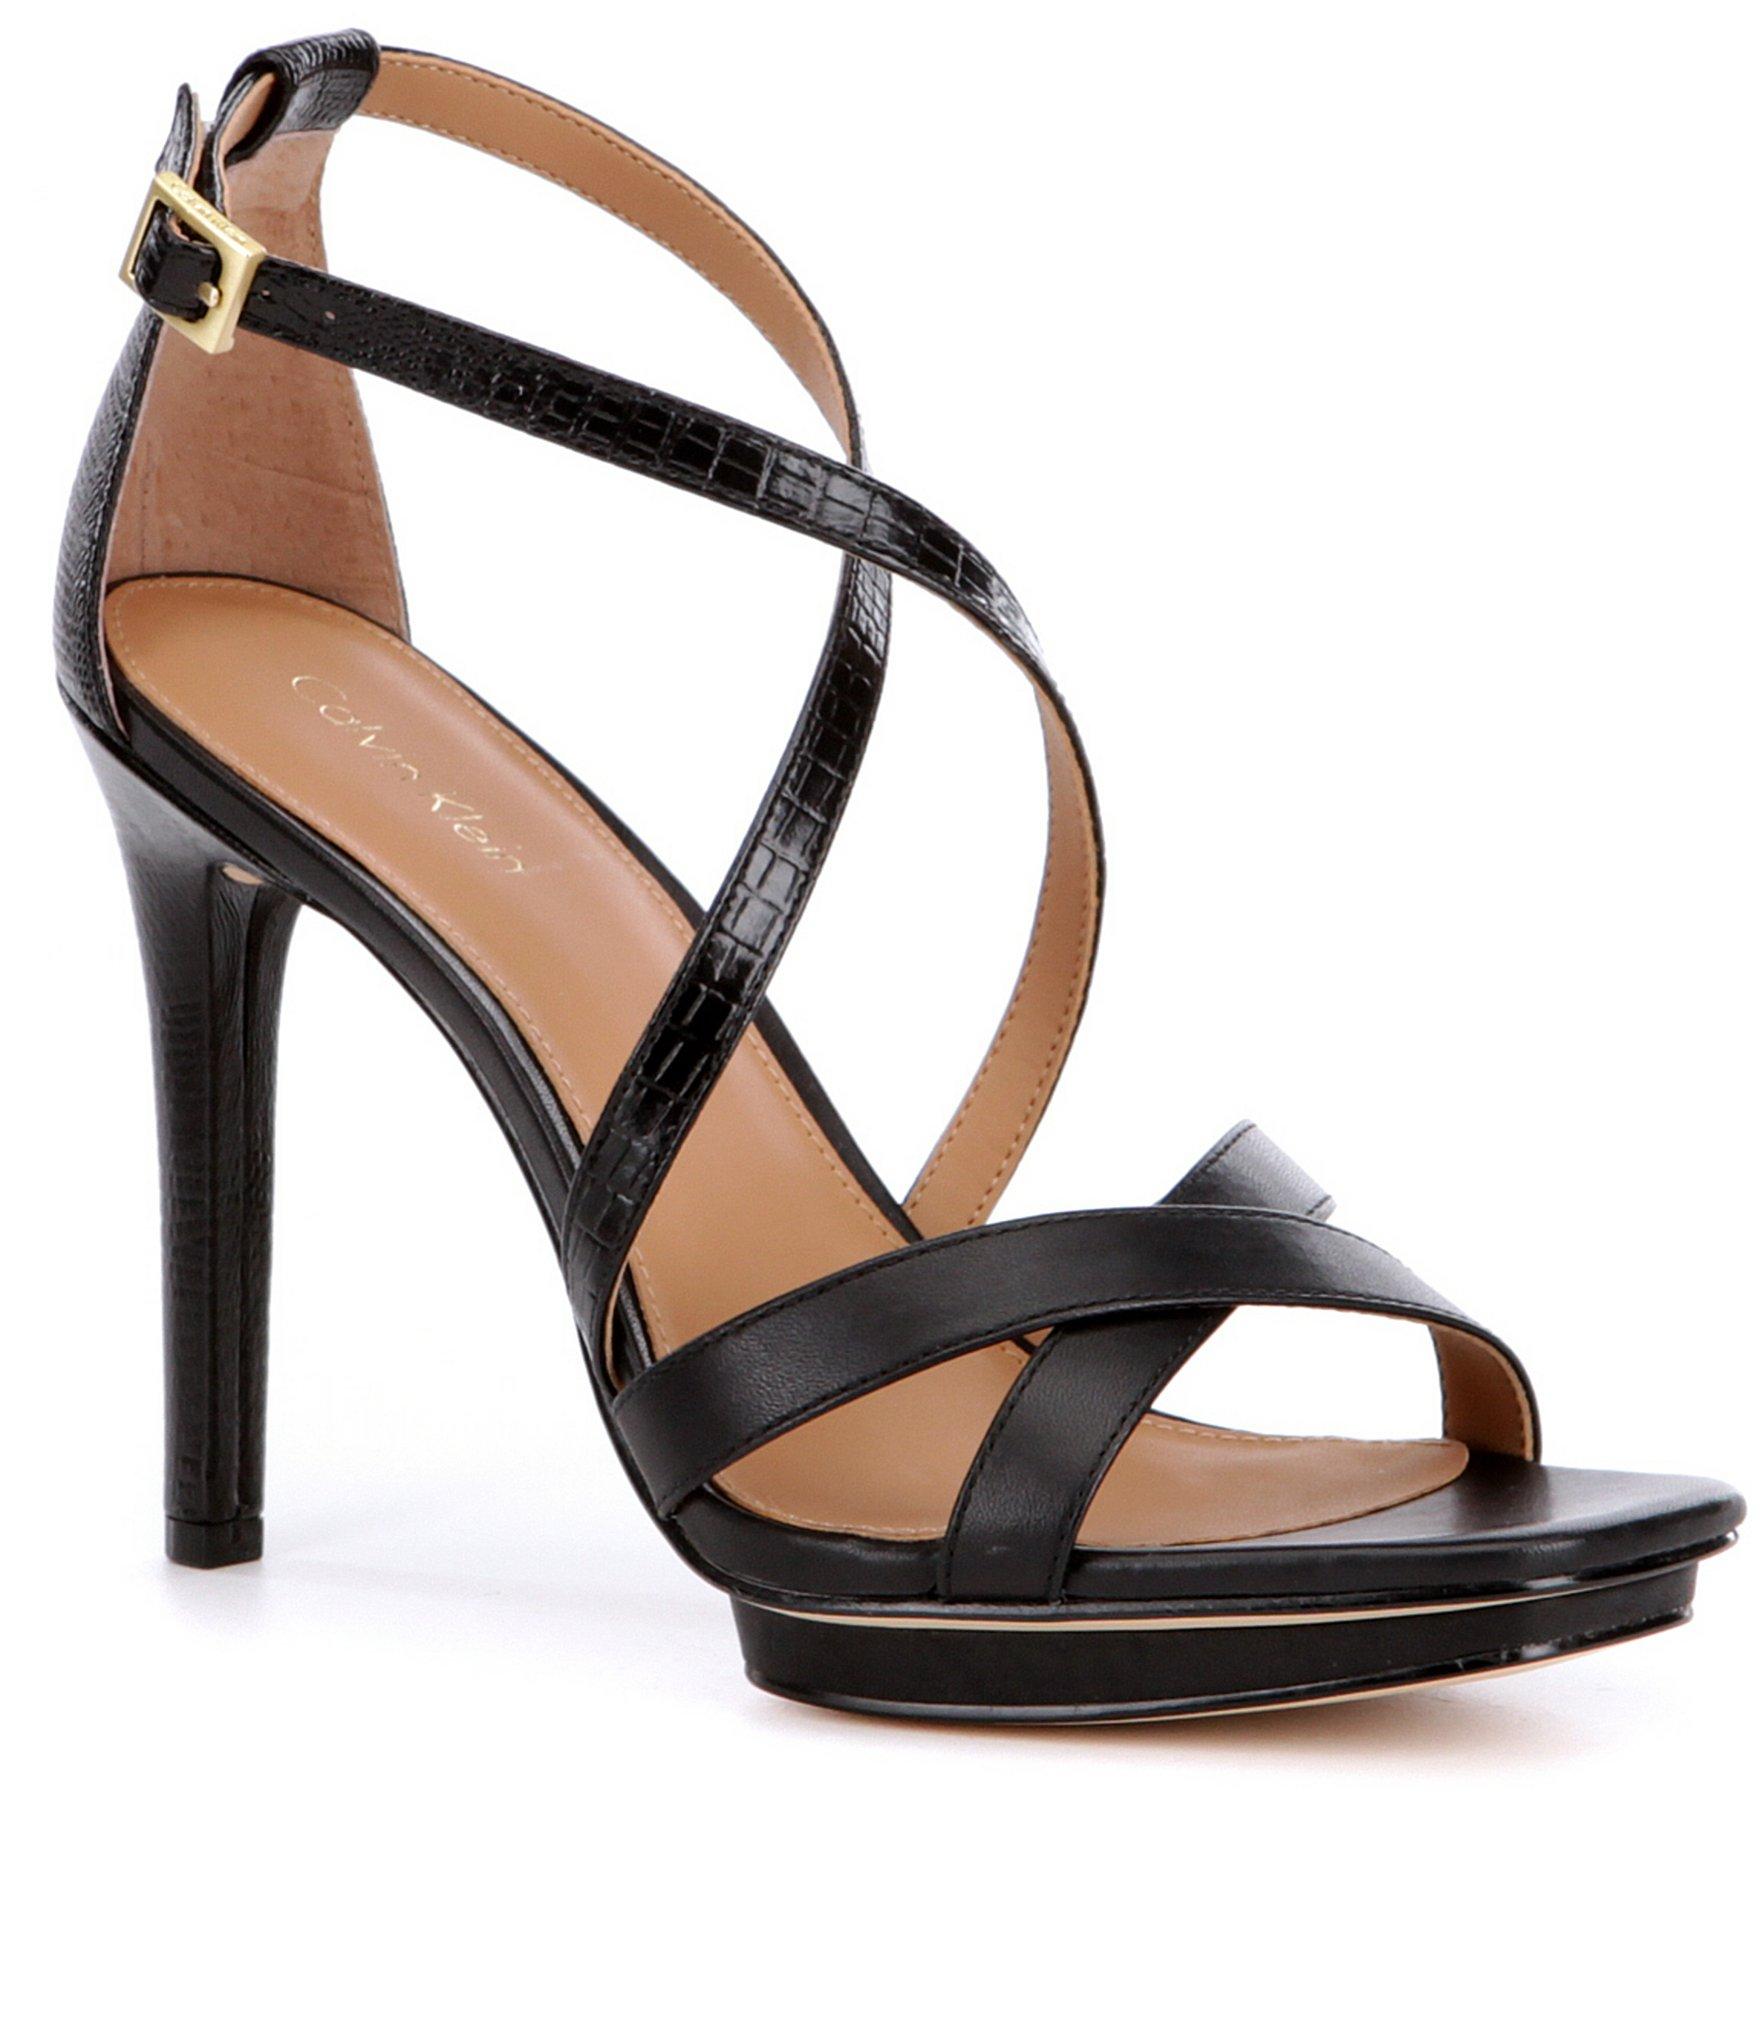 Calvin Klein Dress Shoes Review